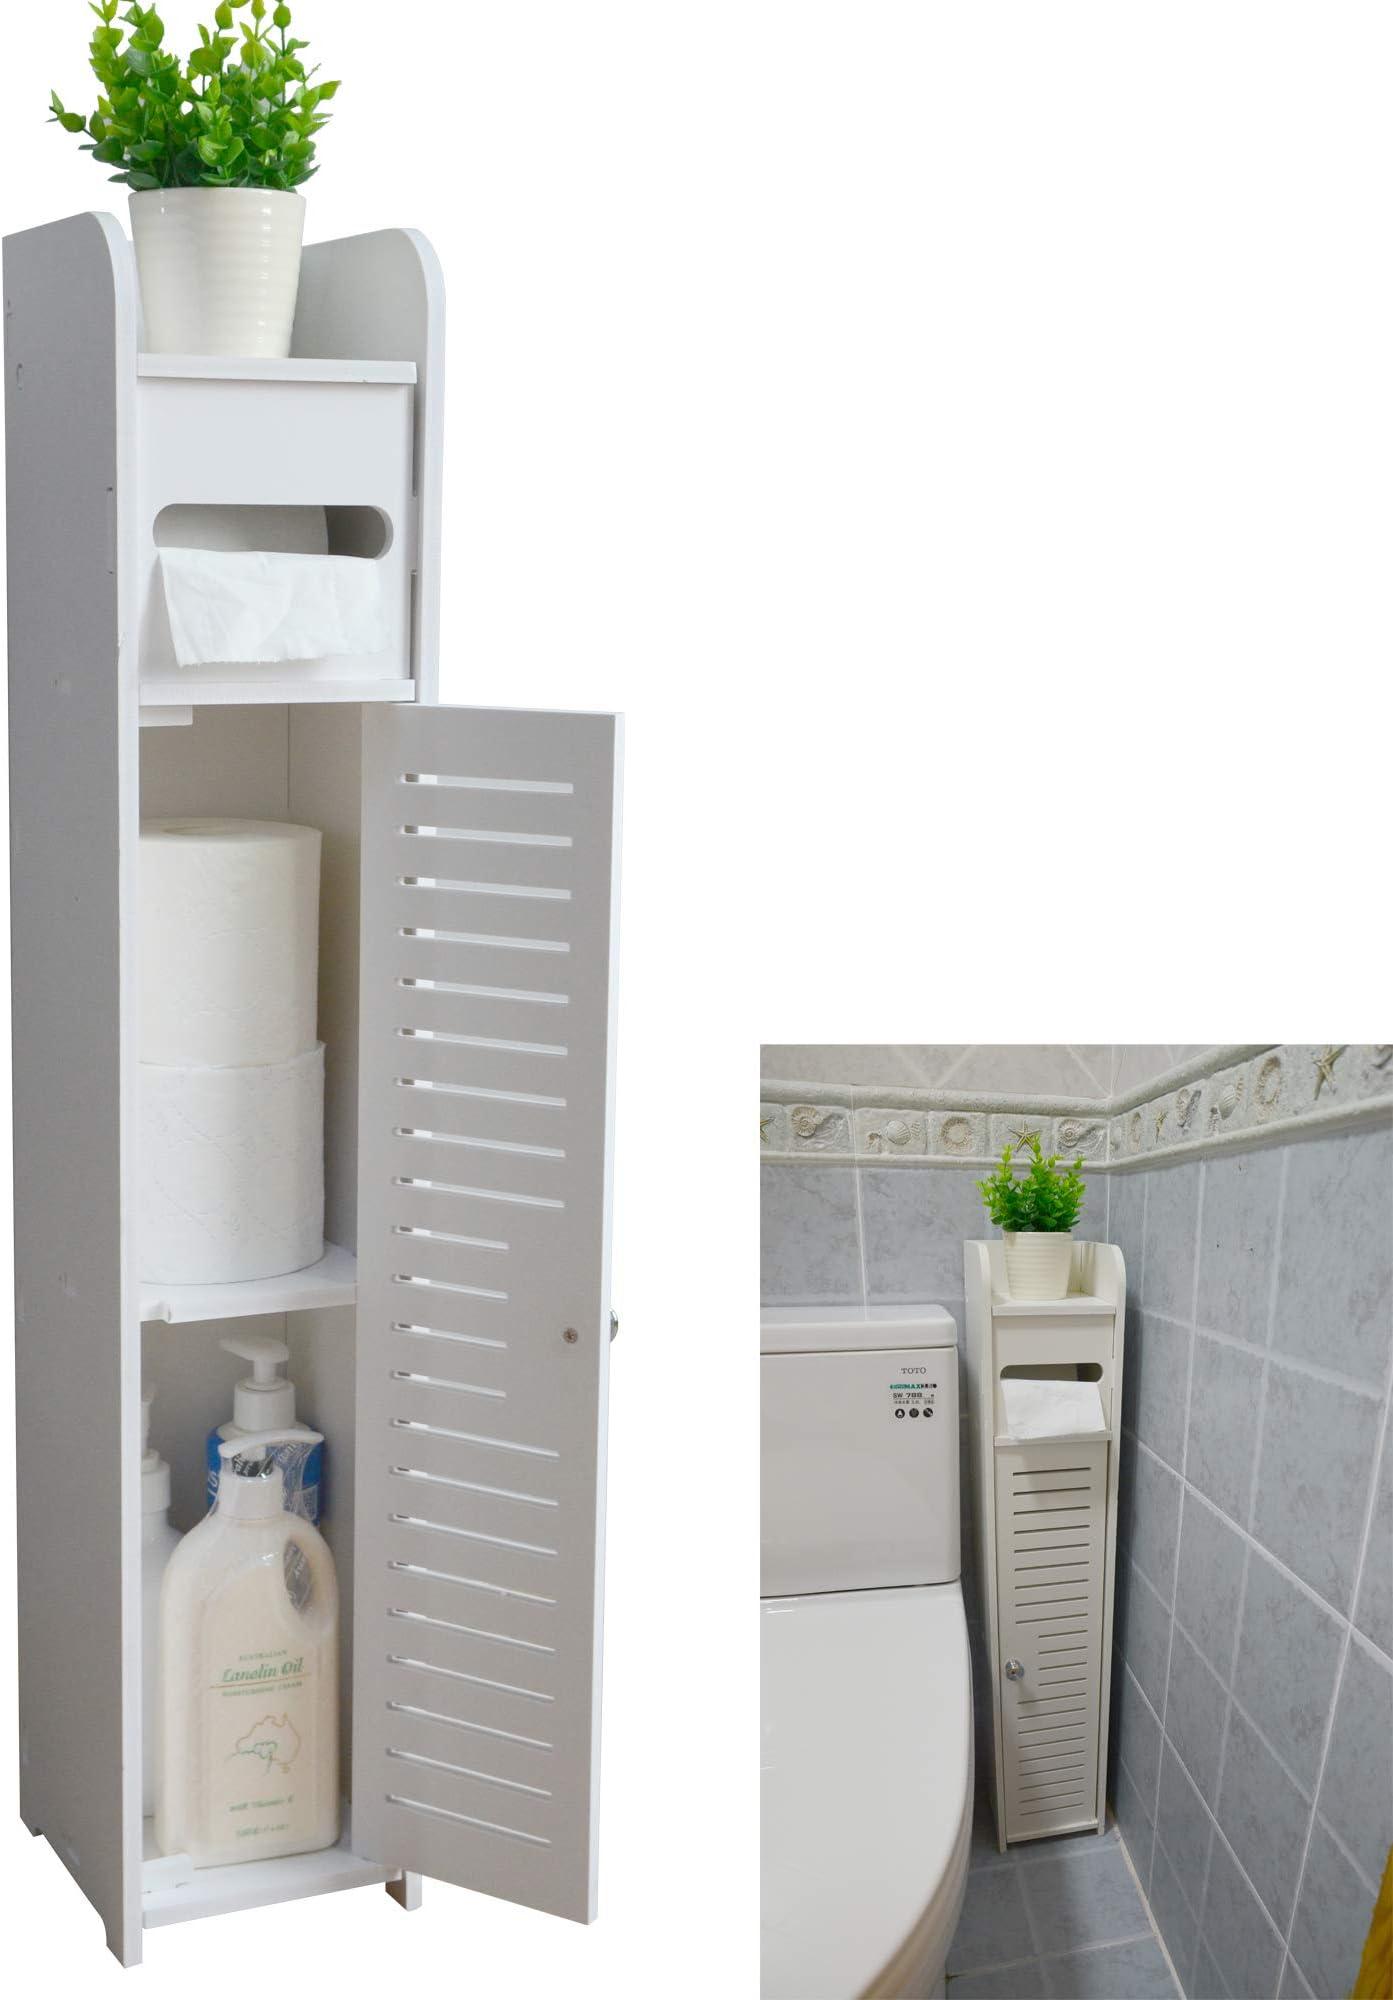 shop amazon com toilet paper storage containers rh amazon com bathroom toilet tissue paper roll storage holder stand bathroom toilet paper storage holder